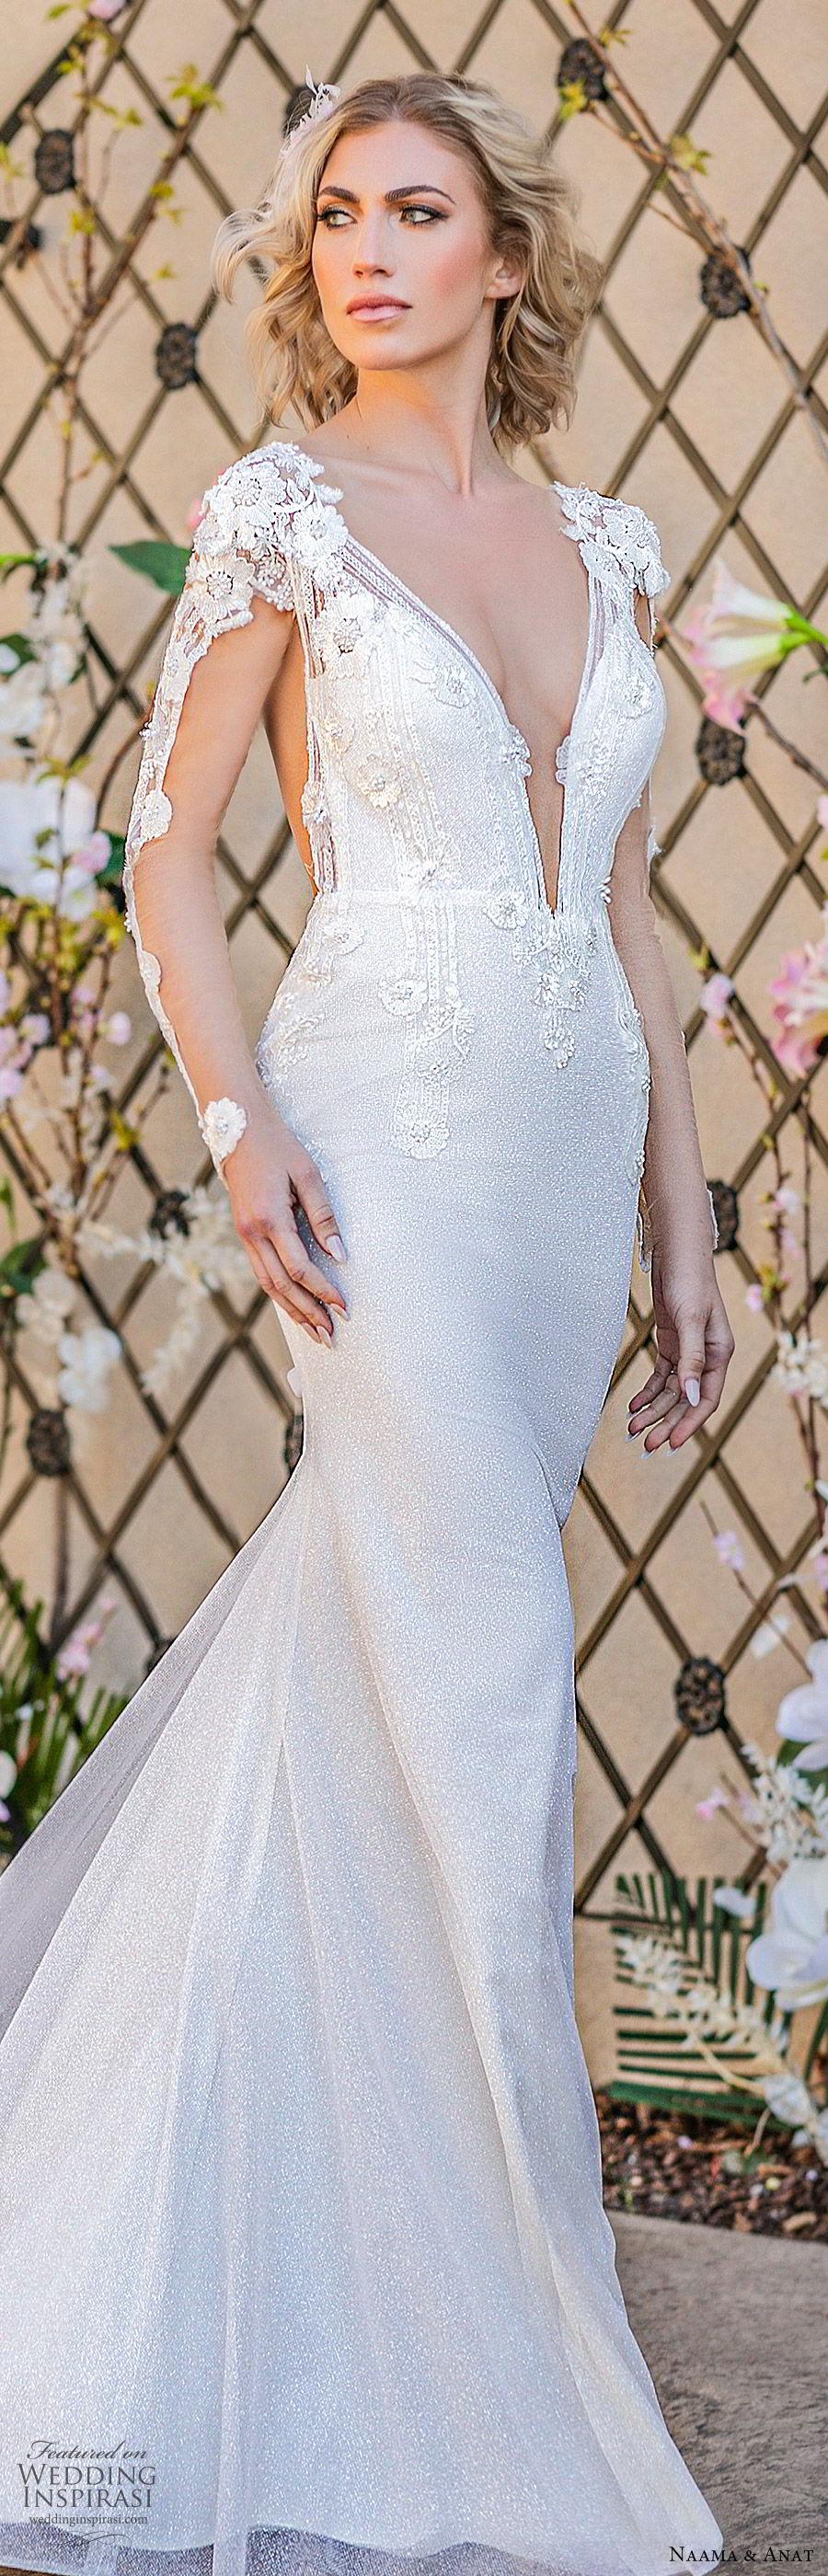 naama anat spring 2020 bridal illusion long sleeves split deep v neckline fully embellished sheath wedding dress (4) sheer back chapel train elegant glam lv